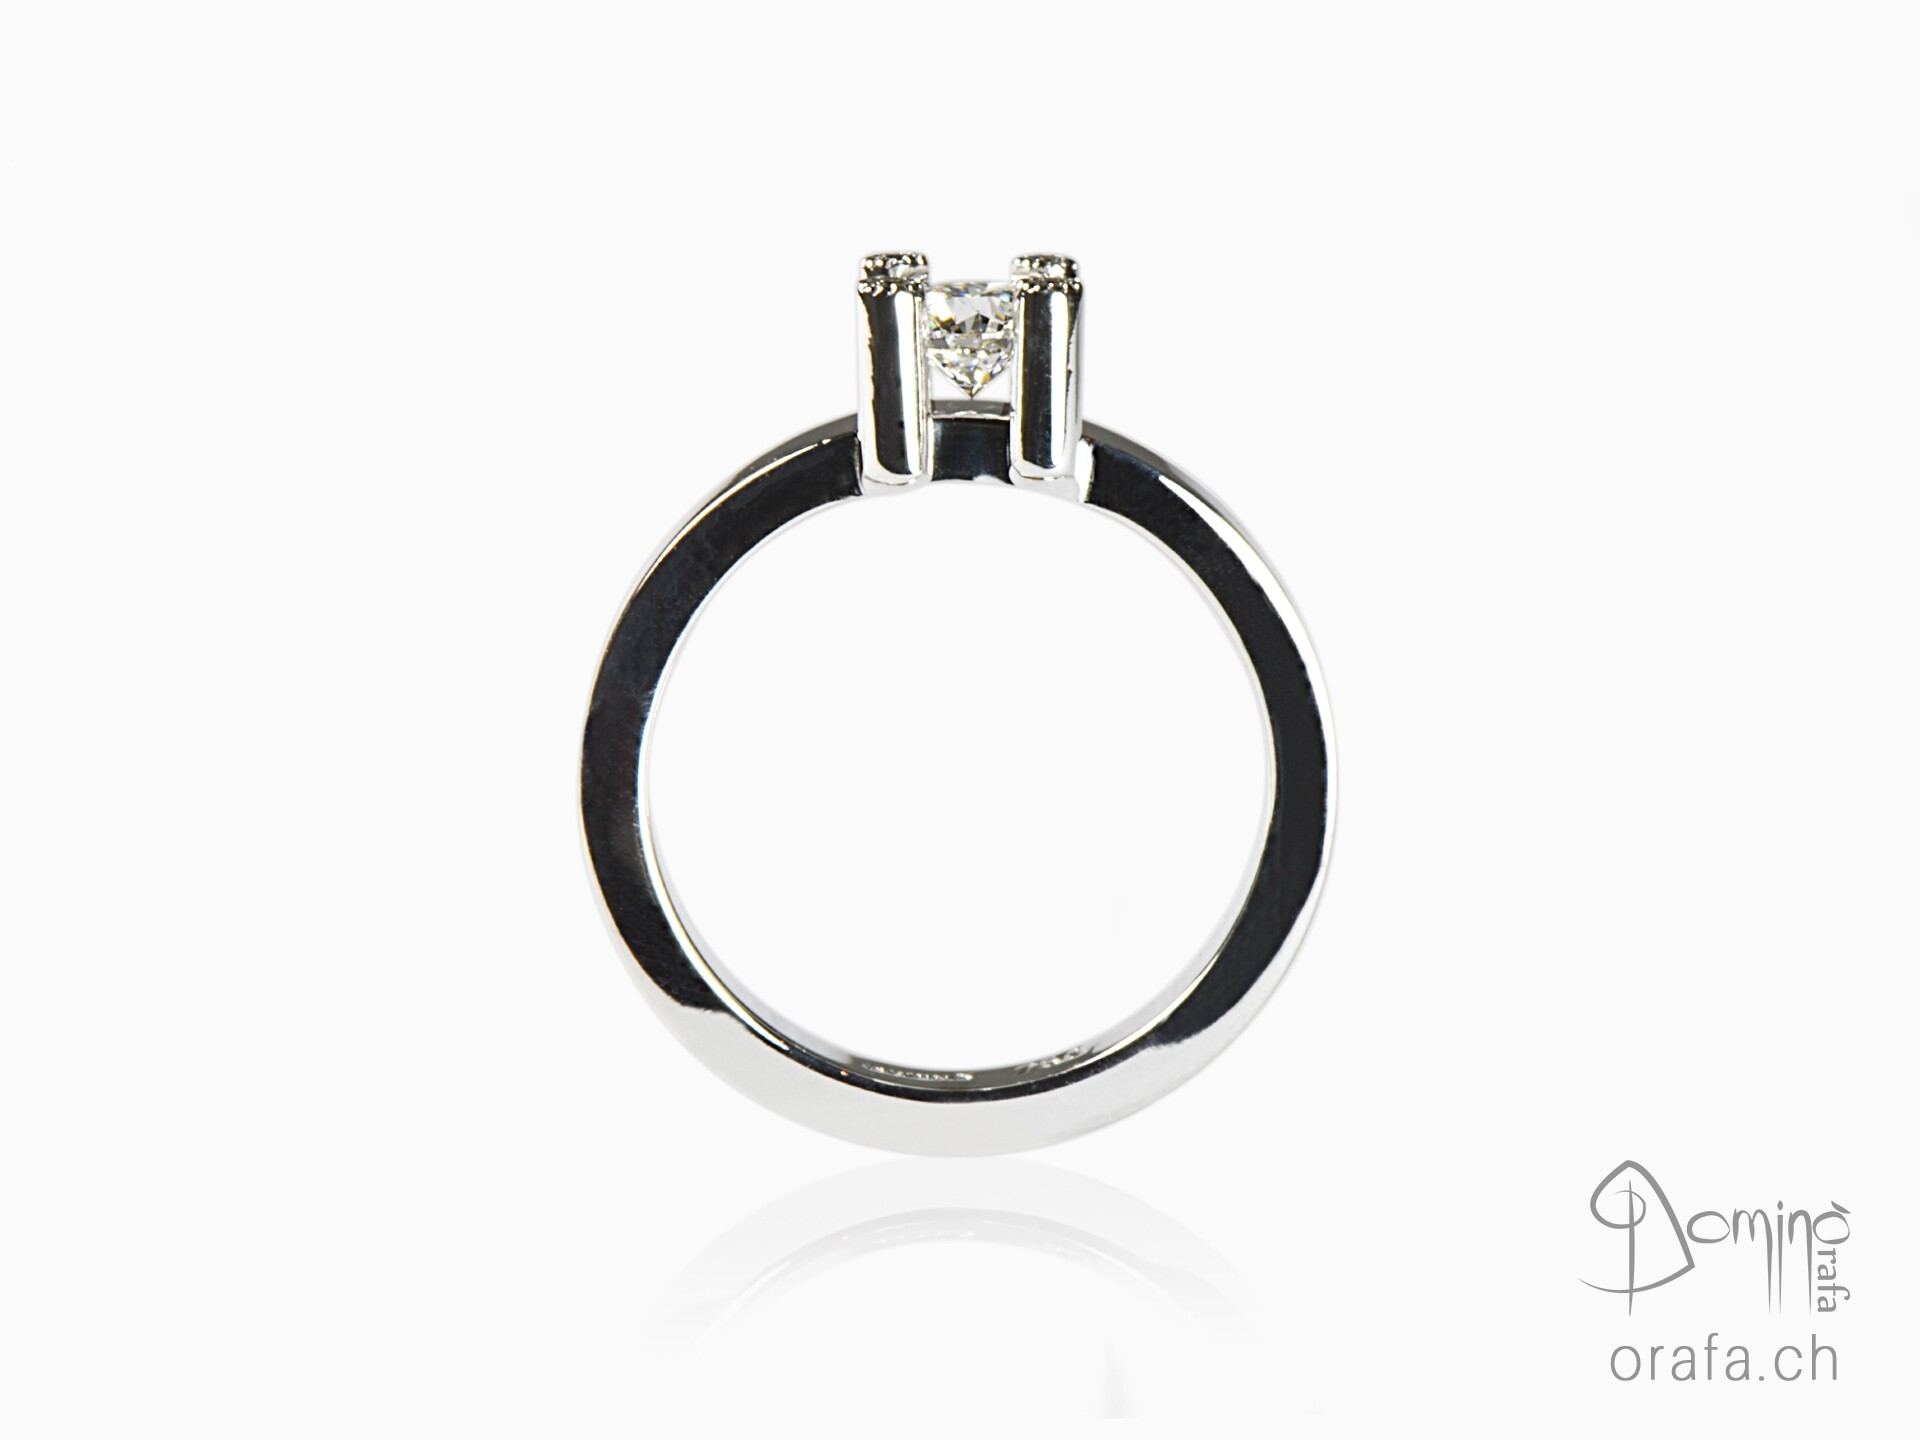 anello-diamante-centrale-4-diamanti-griffes-1